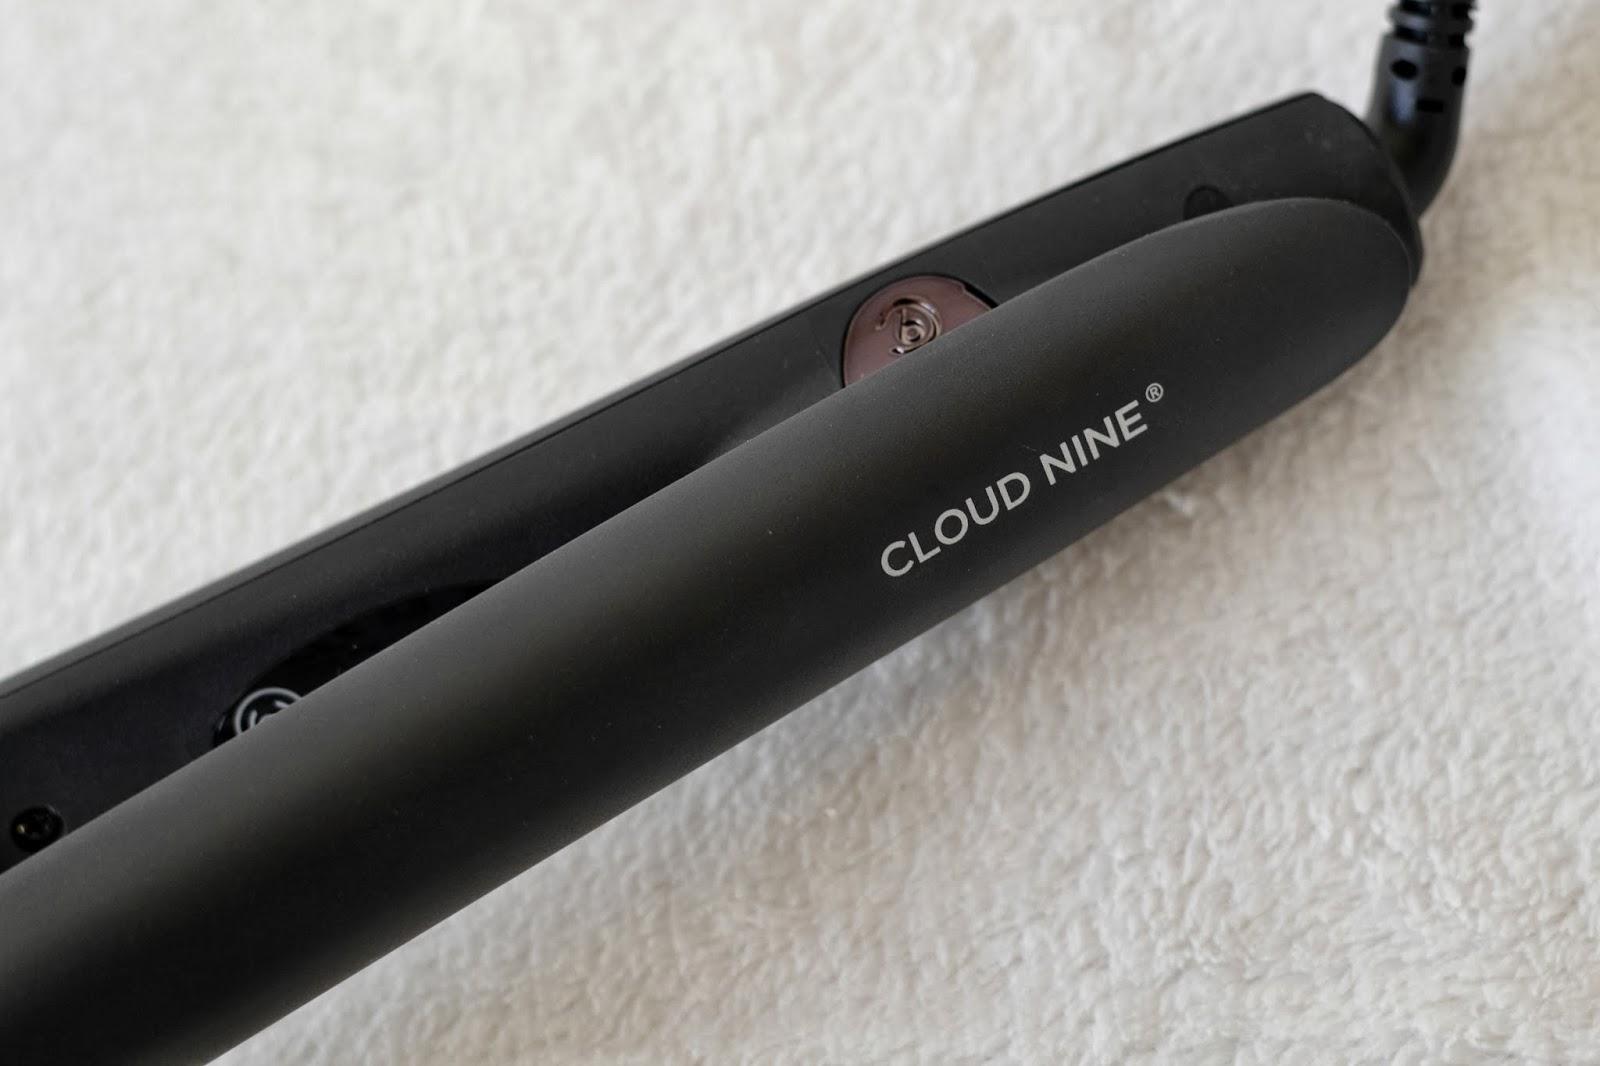 how to fix cloud nine straighteners